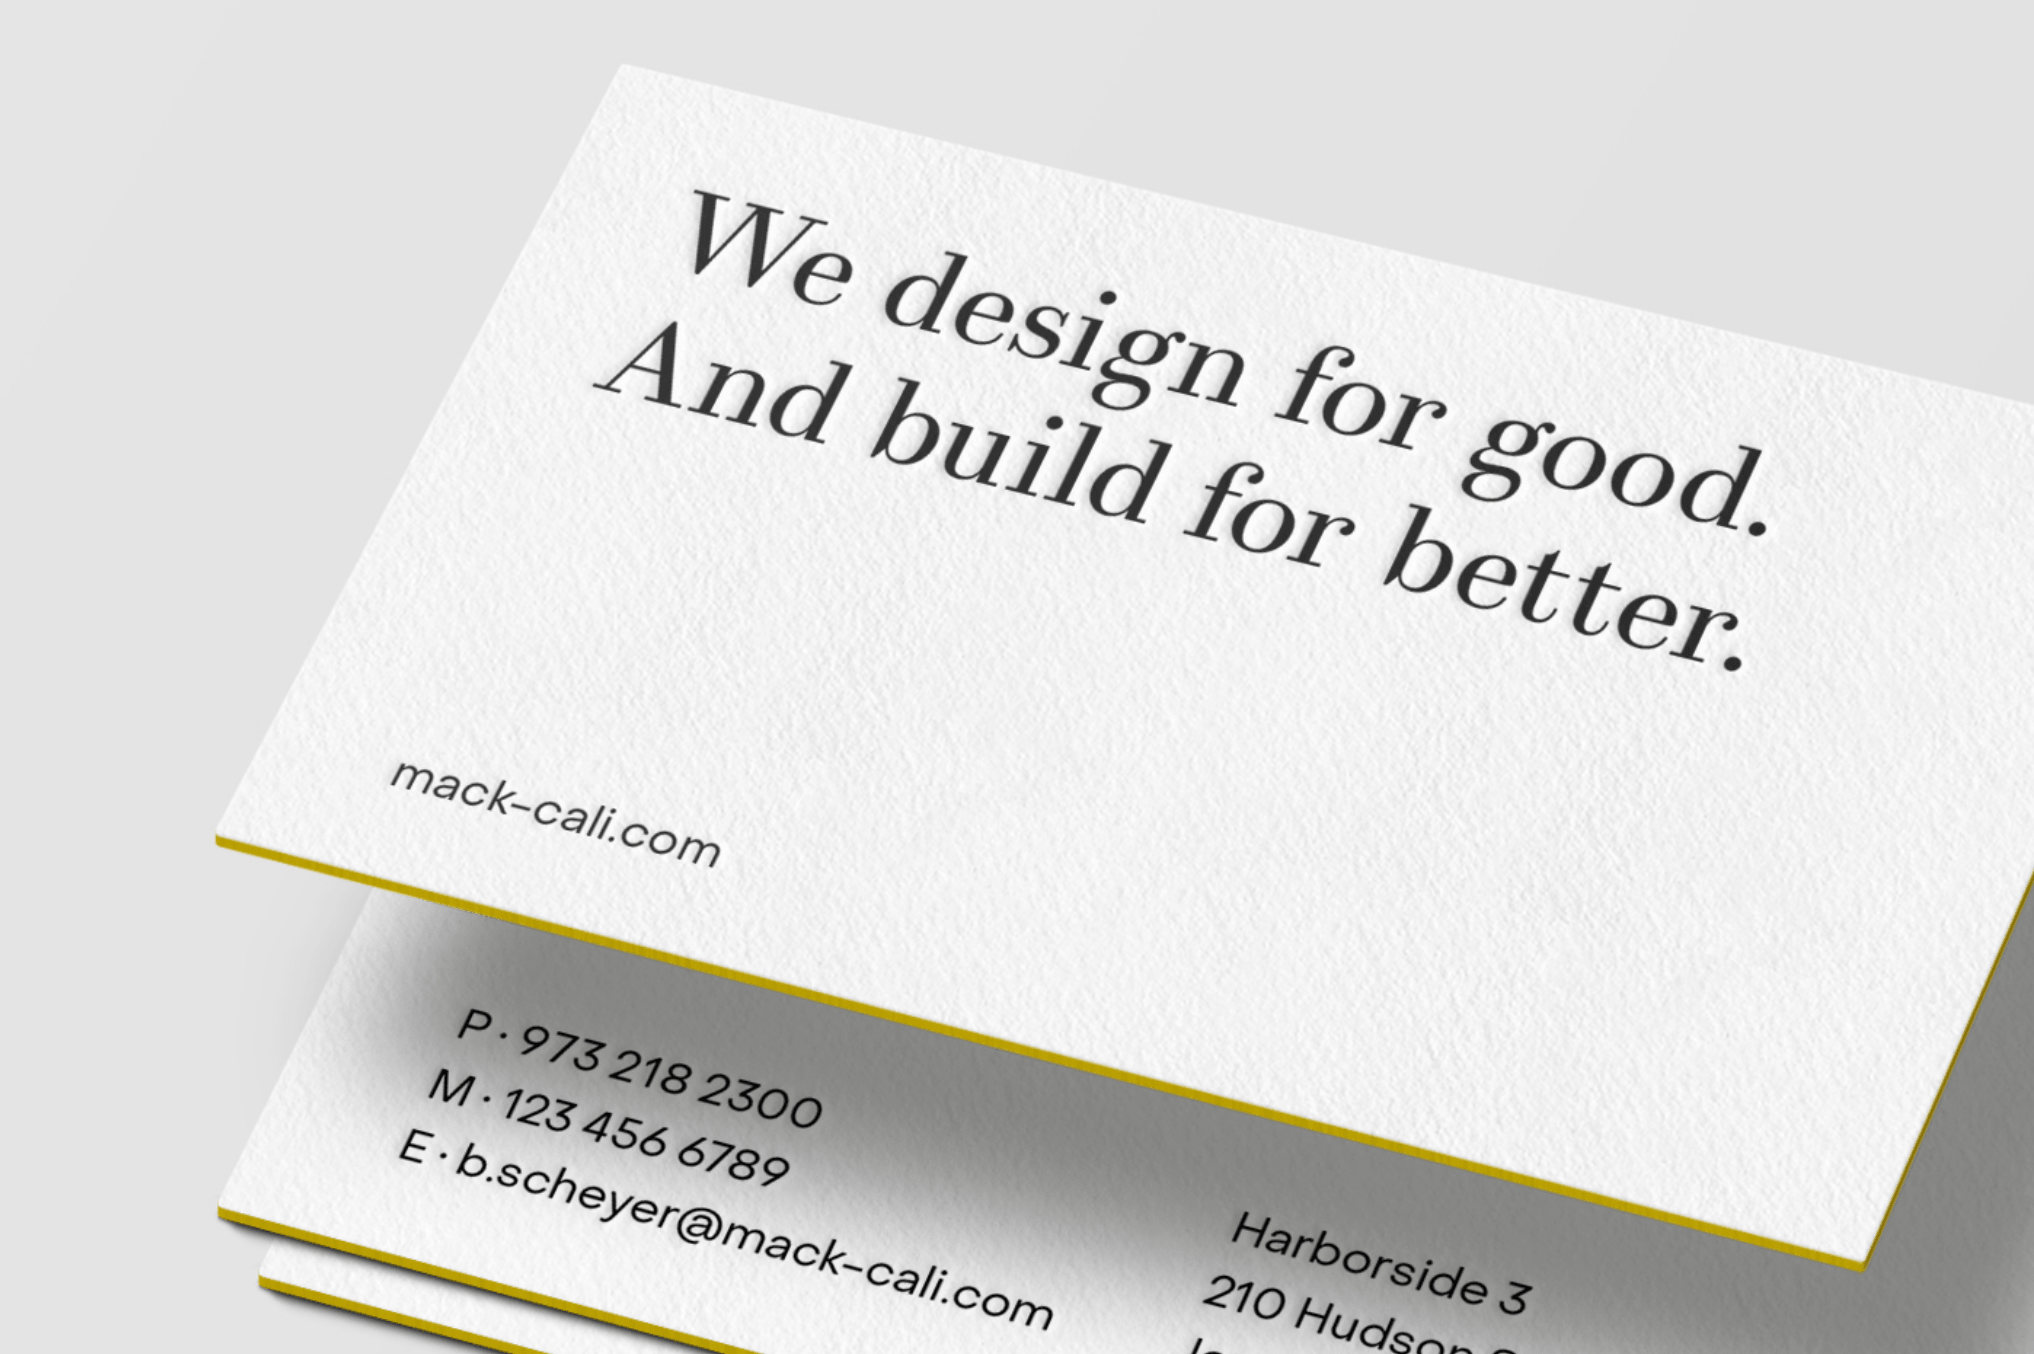 REA_Mack-Cali_Business-Card